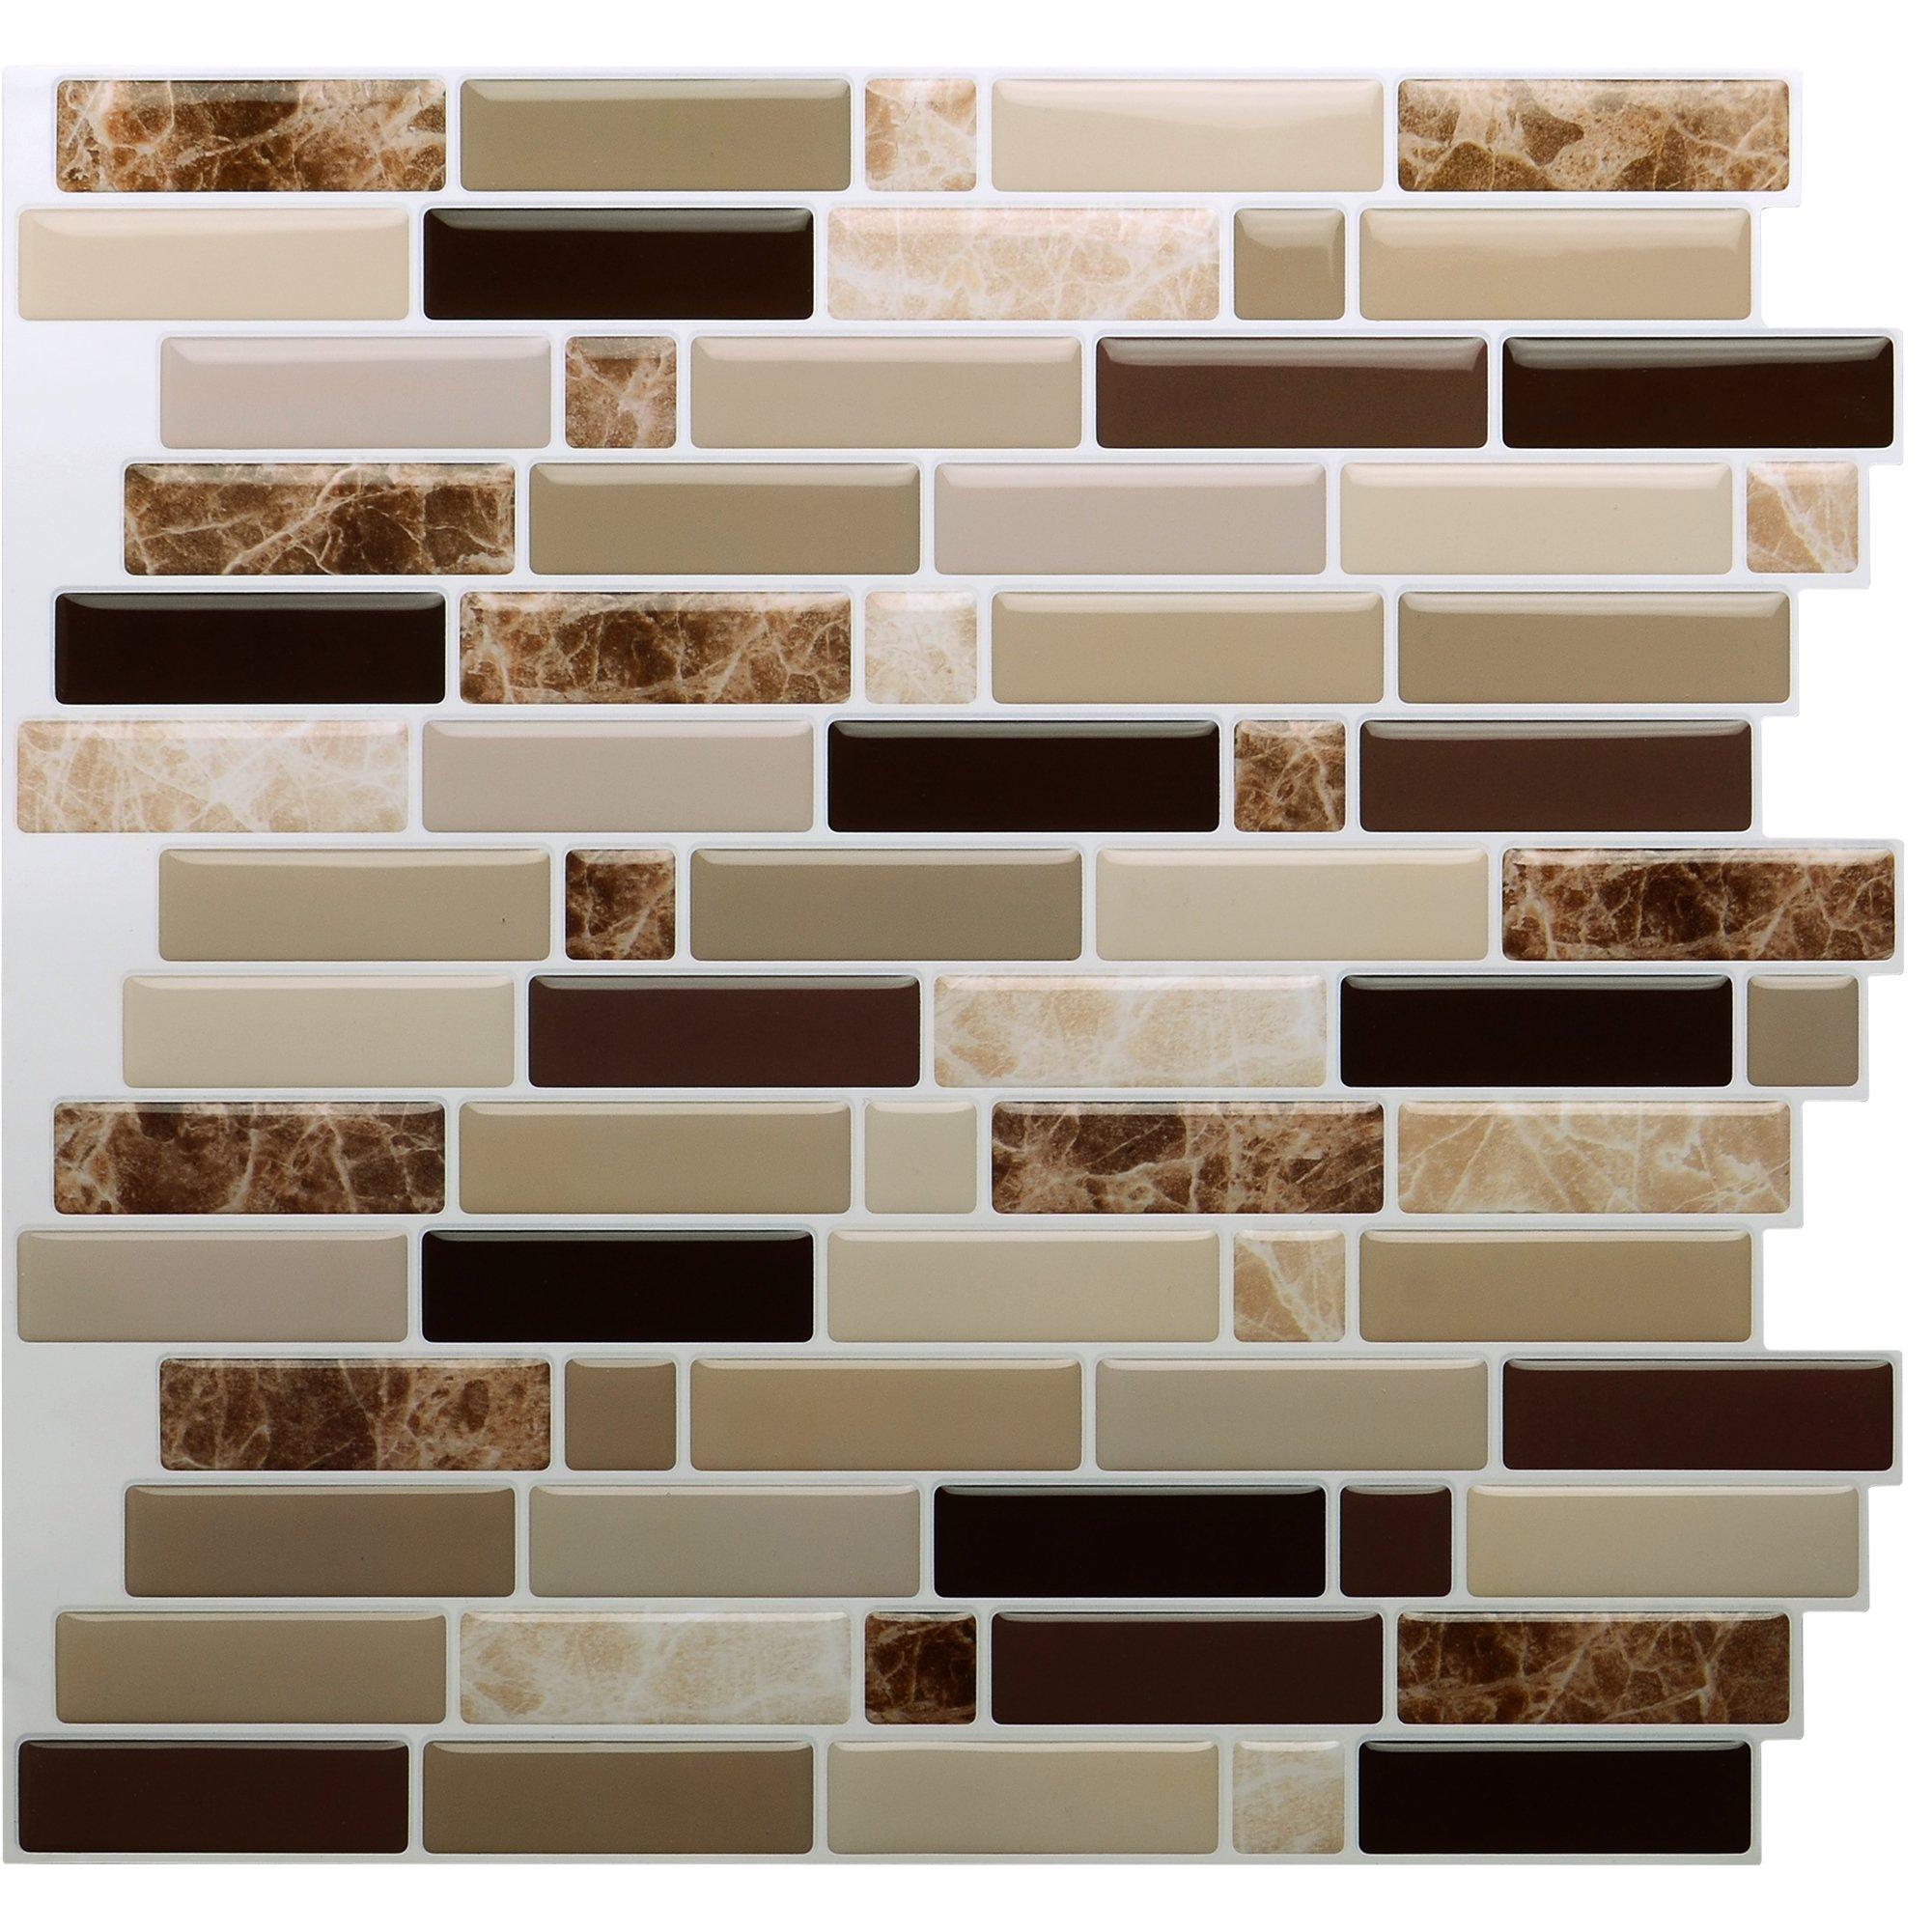 Vamos Tile Premium Anti Mold Peel and Stick Tile Backsplash,Stick On Backsplash Wall Tiles for Kitchen & Bathroom-Self Adhesive-10.62'' x 10'' (6 Sheets)